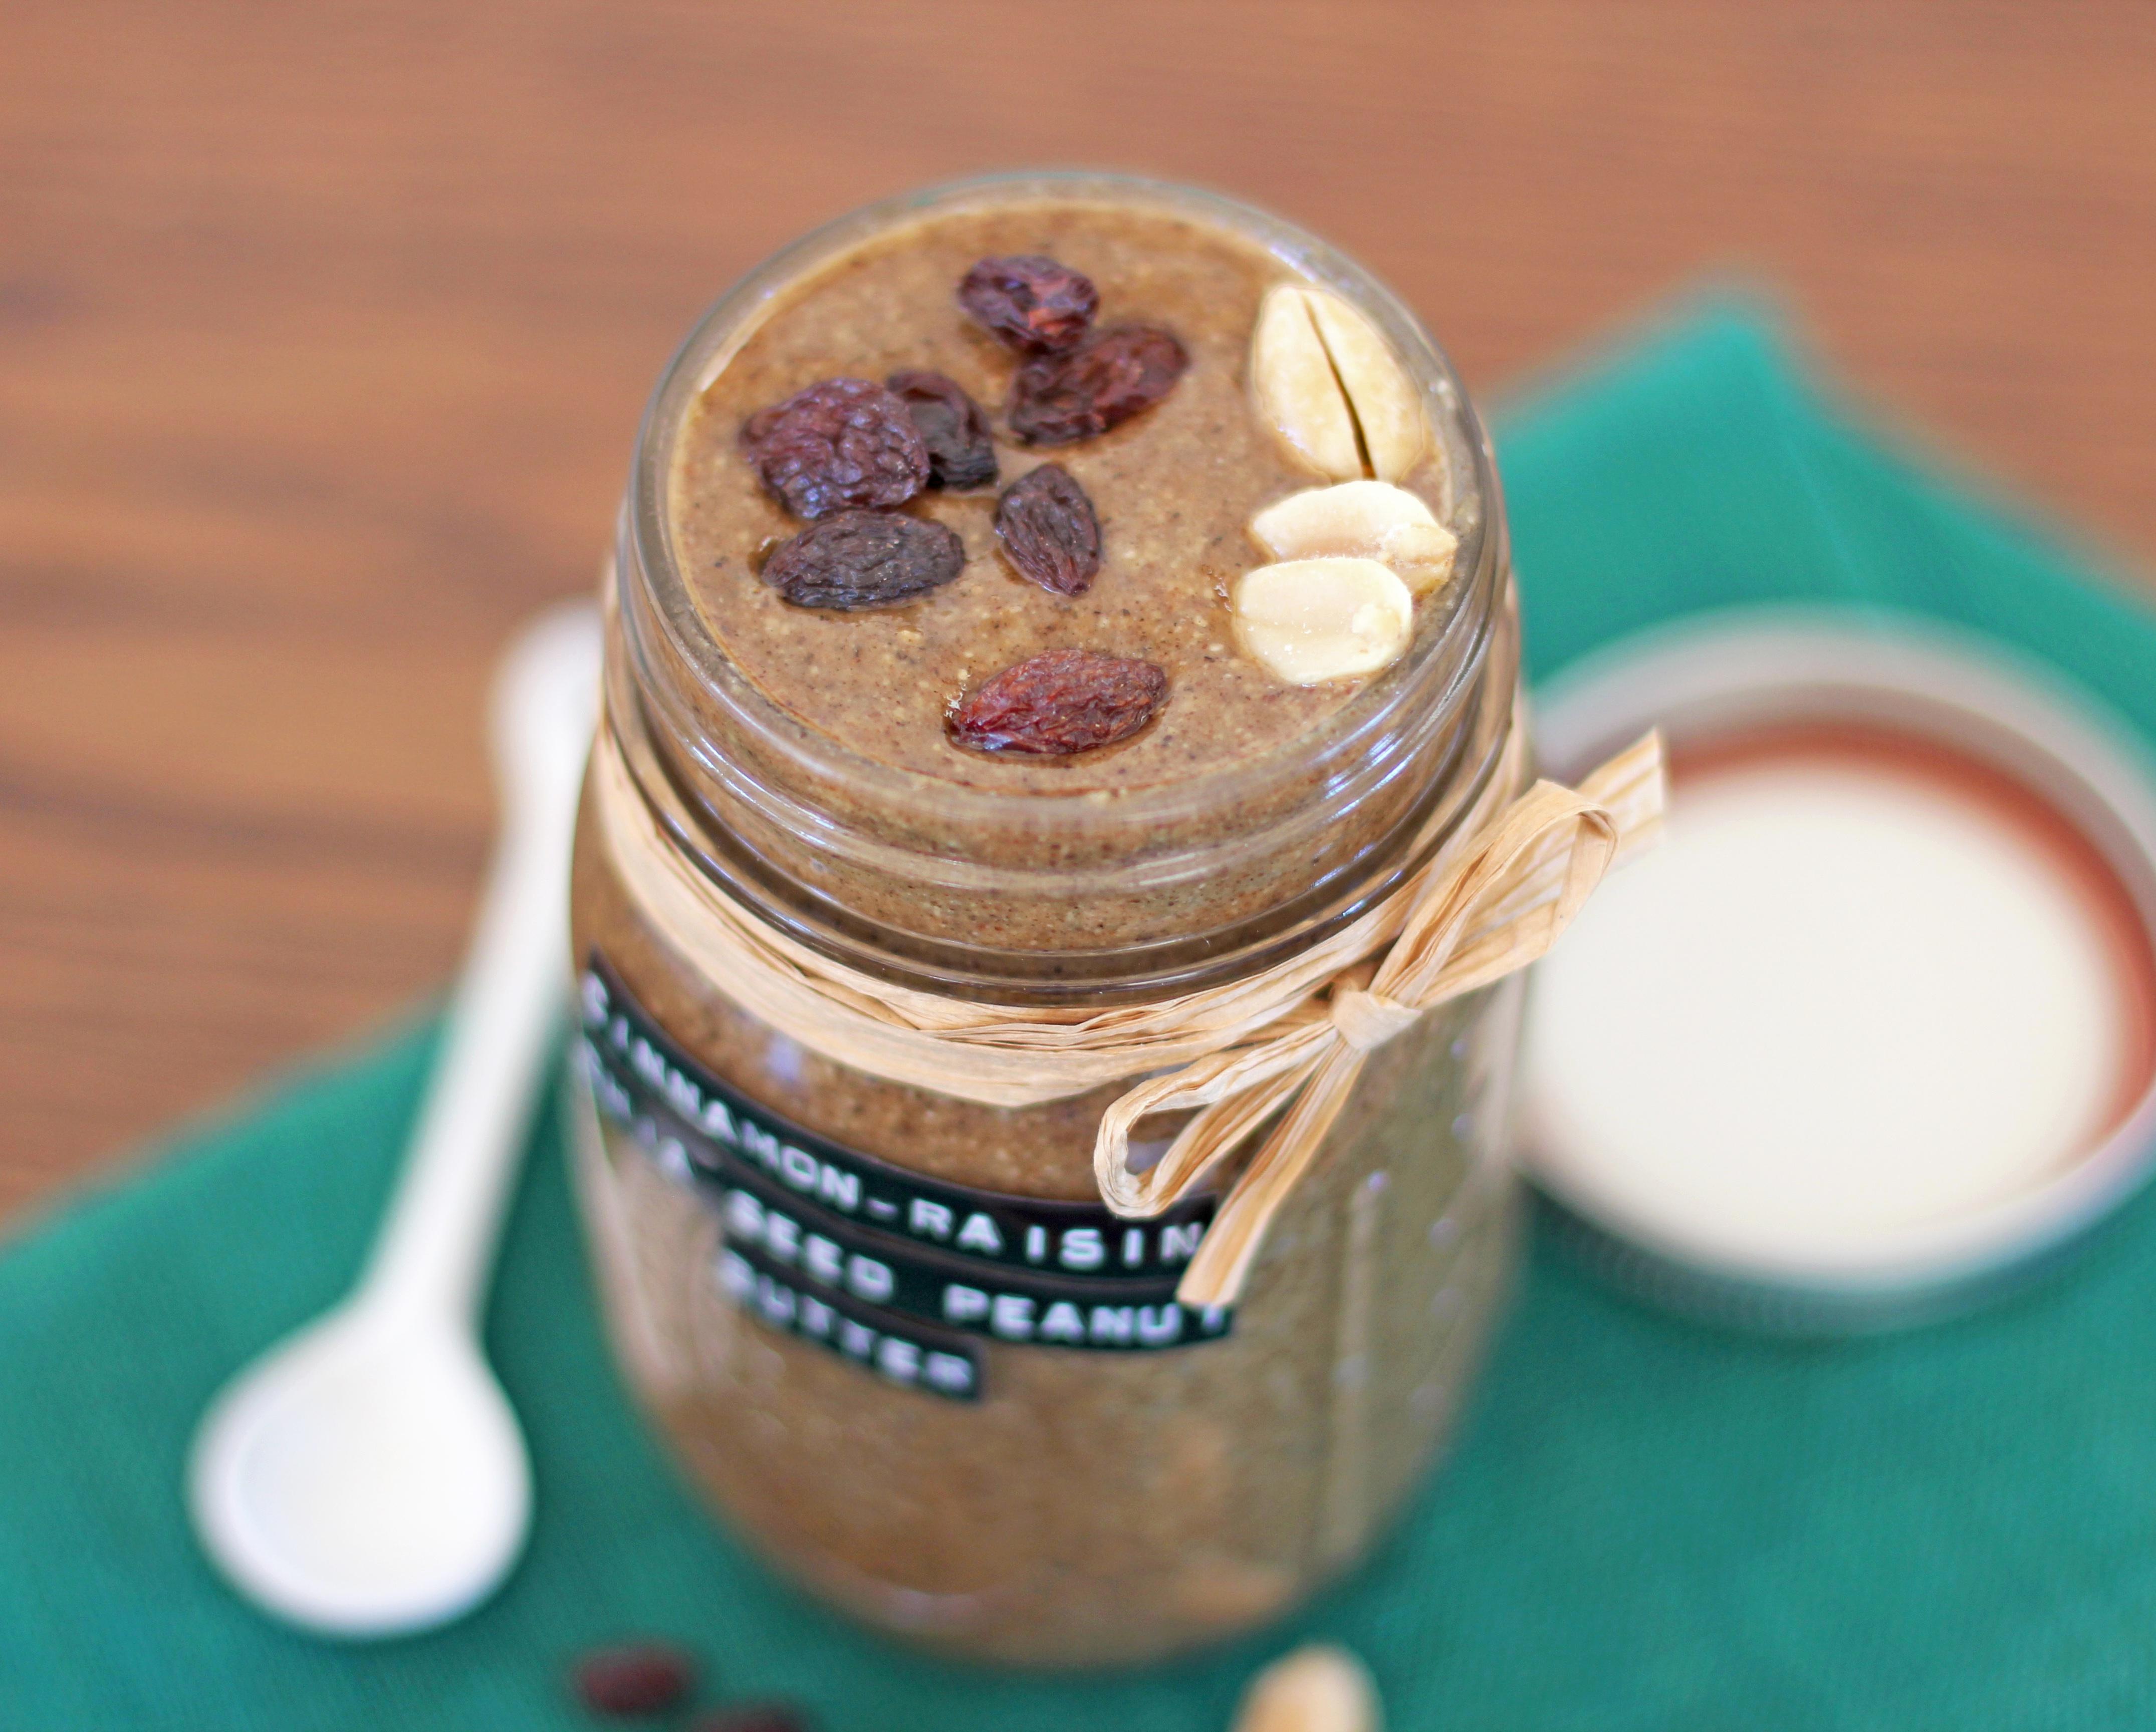 Healthy Cinnamon Raisin Chia Seed Peanut Butter (refined sugar free, gluten free, dairy free, vegan) - Healthy Dessert Recipes at Desserts with Benefits